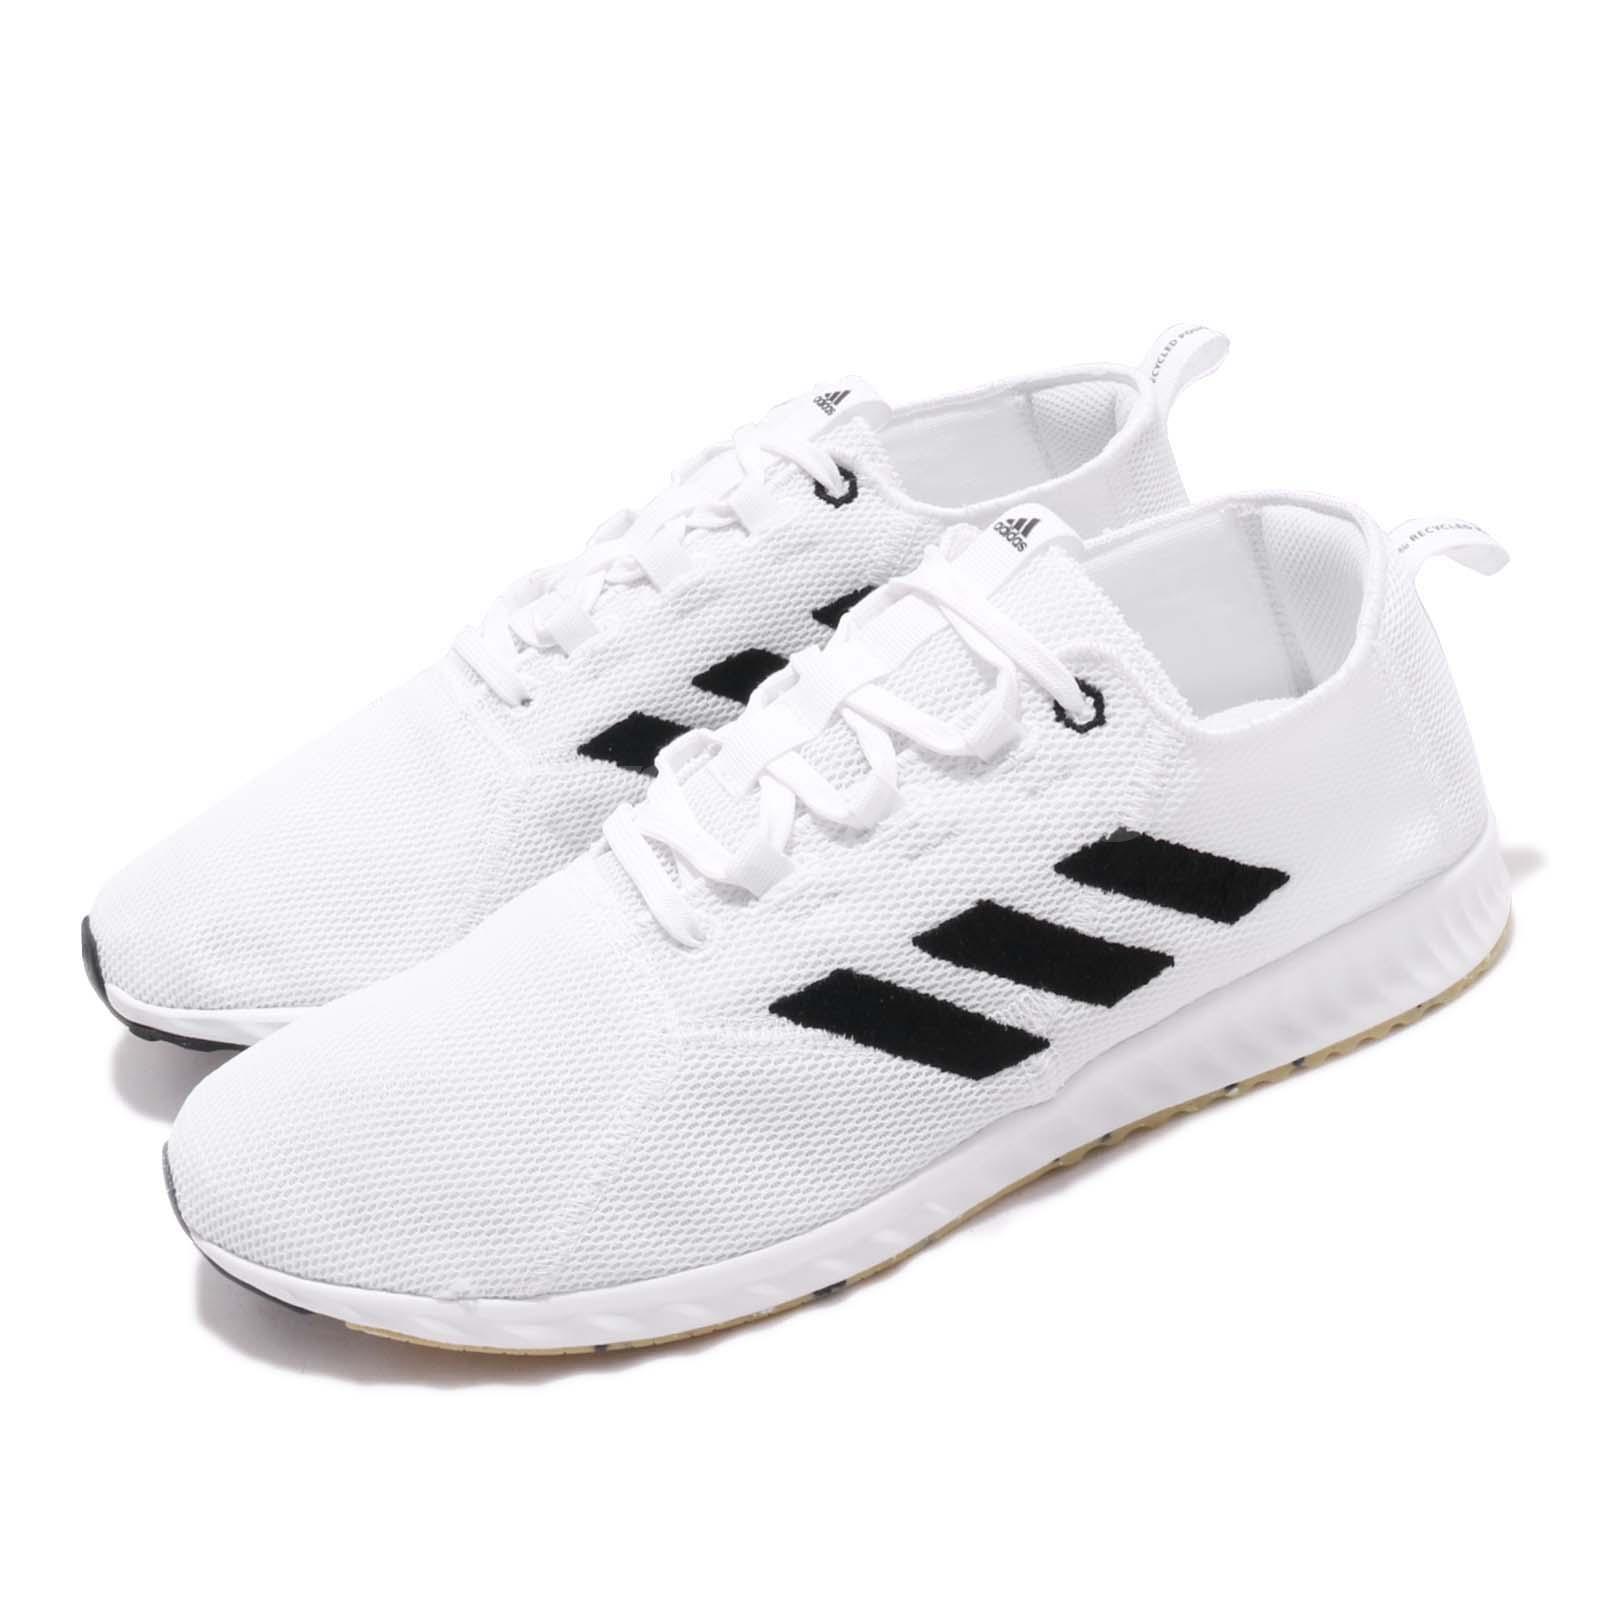 mizuno womens volleyball shoes size 8 x 3 free grey adidas iniki